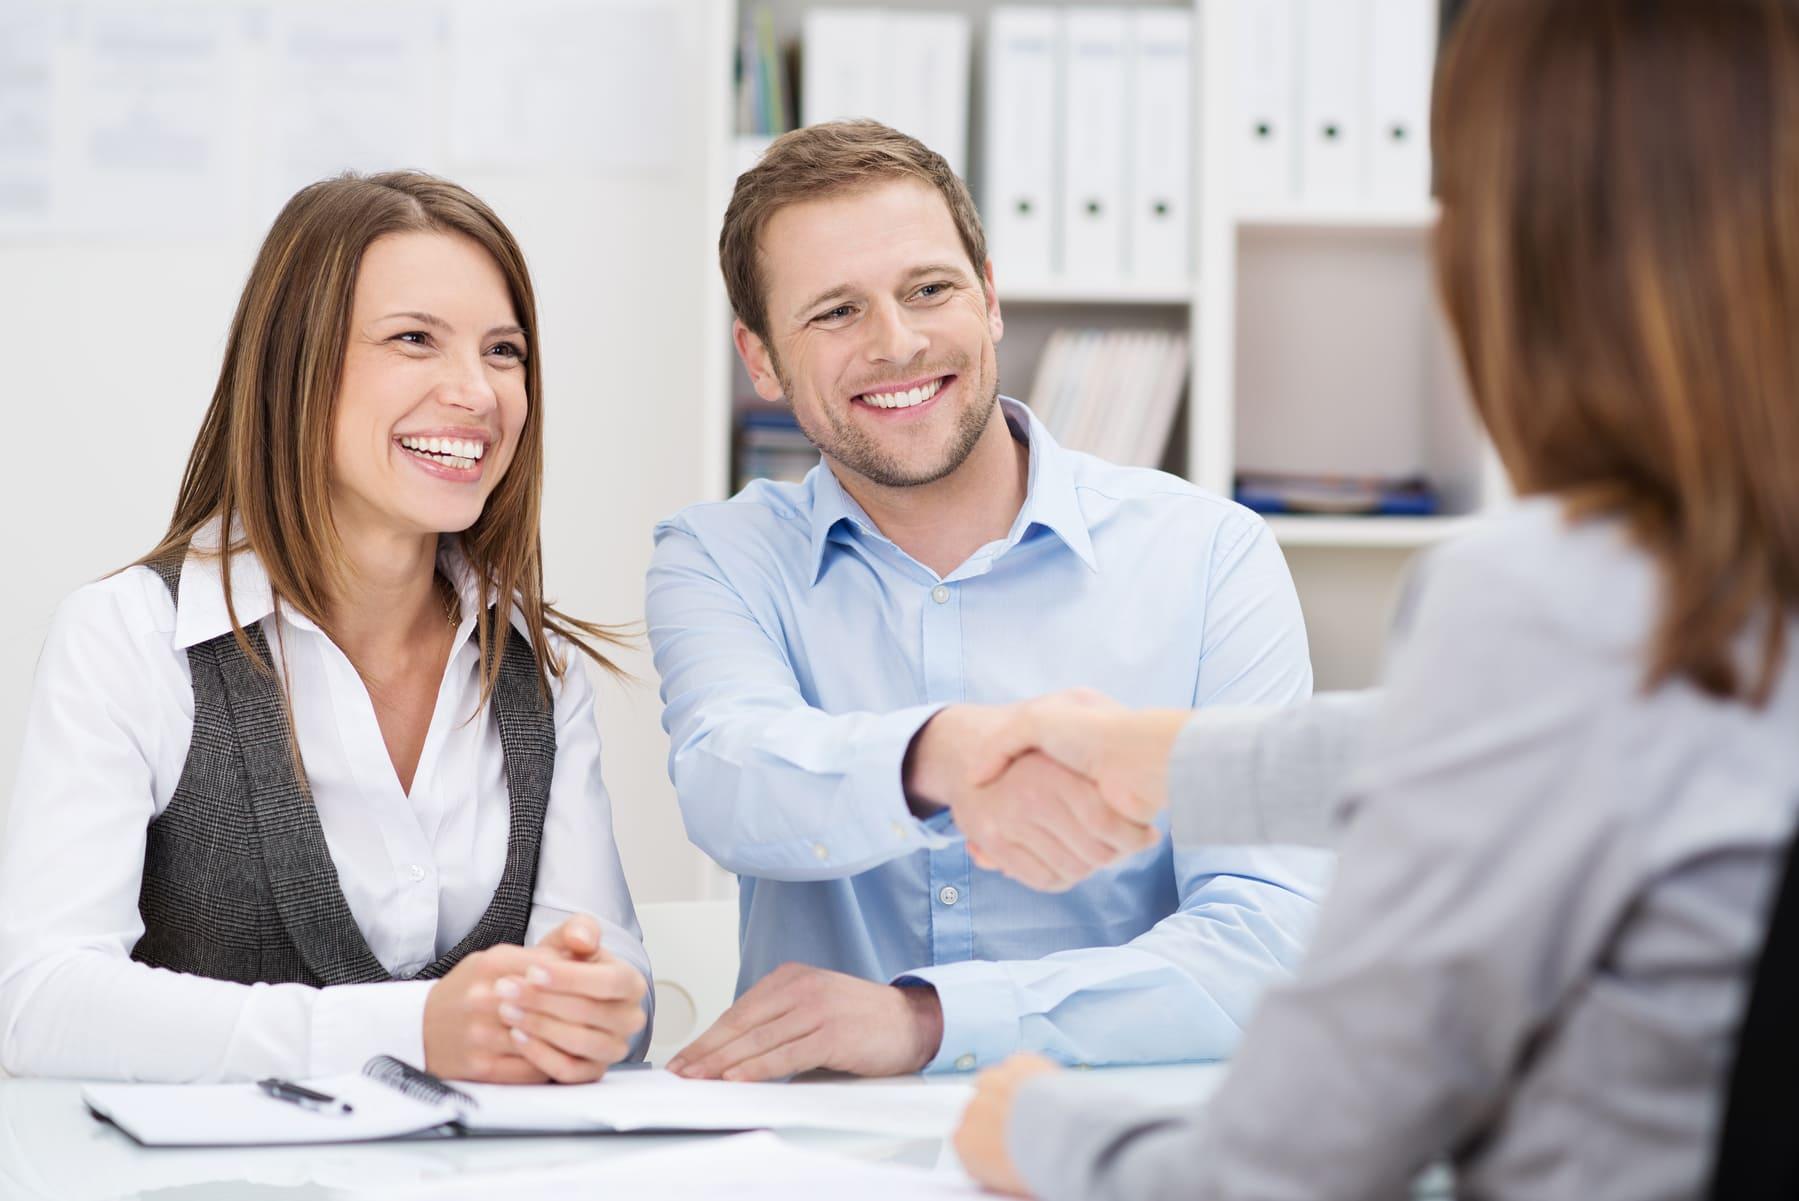 Arbeitgeber-Evaluation